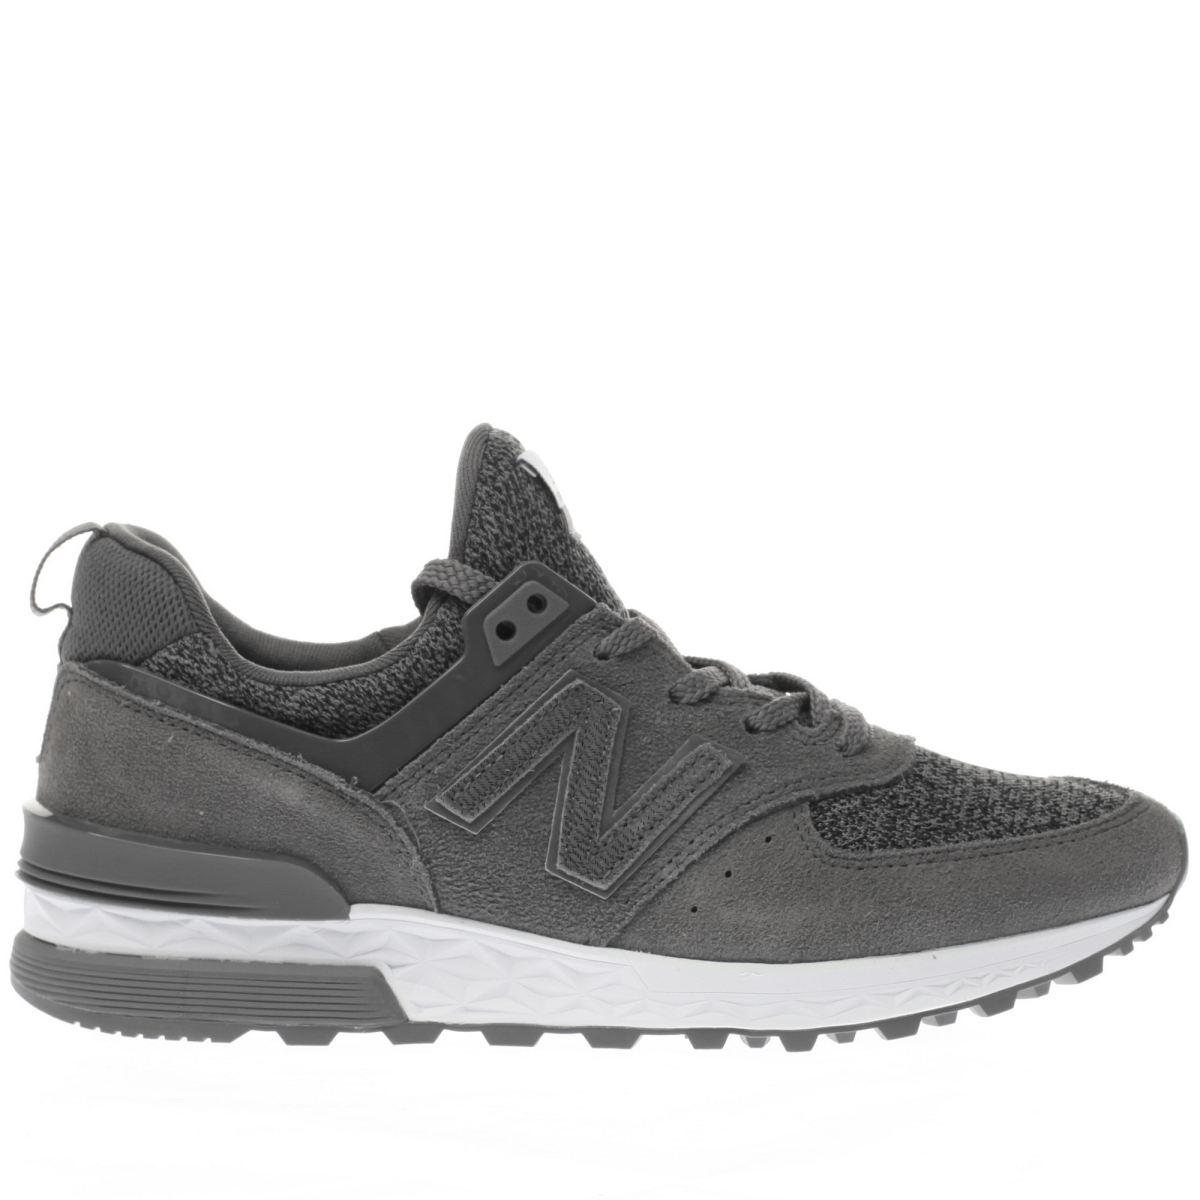 new balance grey 574 sport trainers